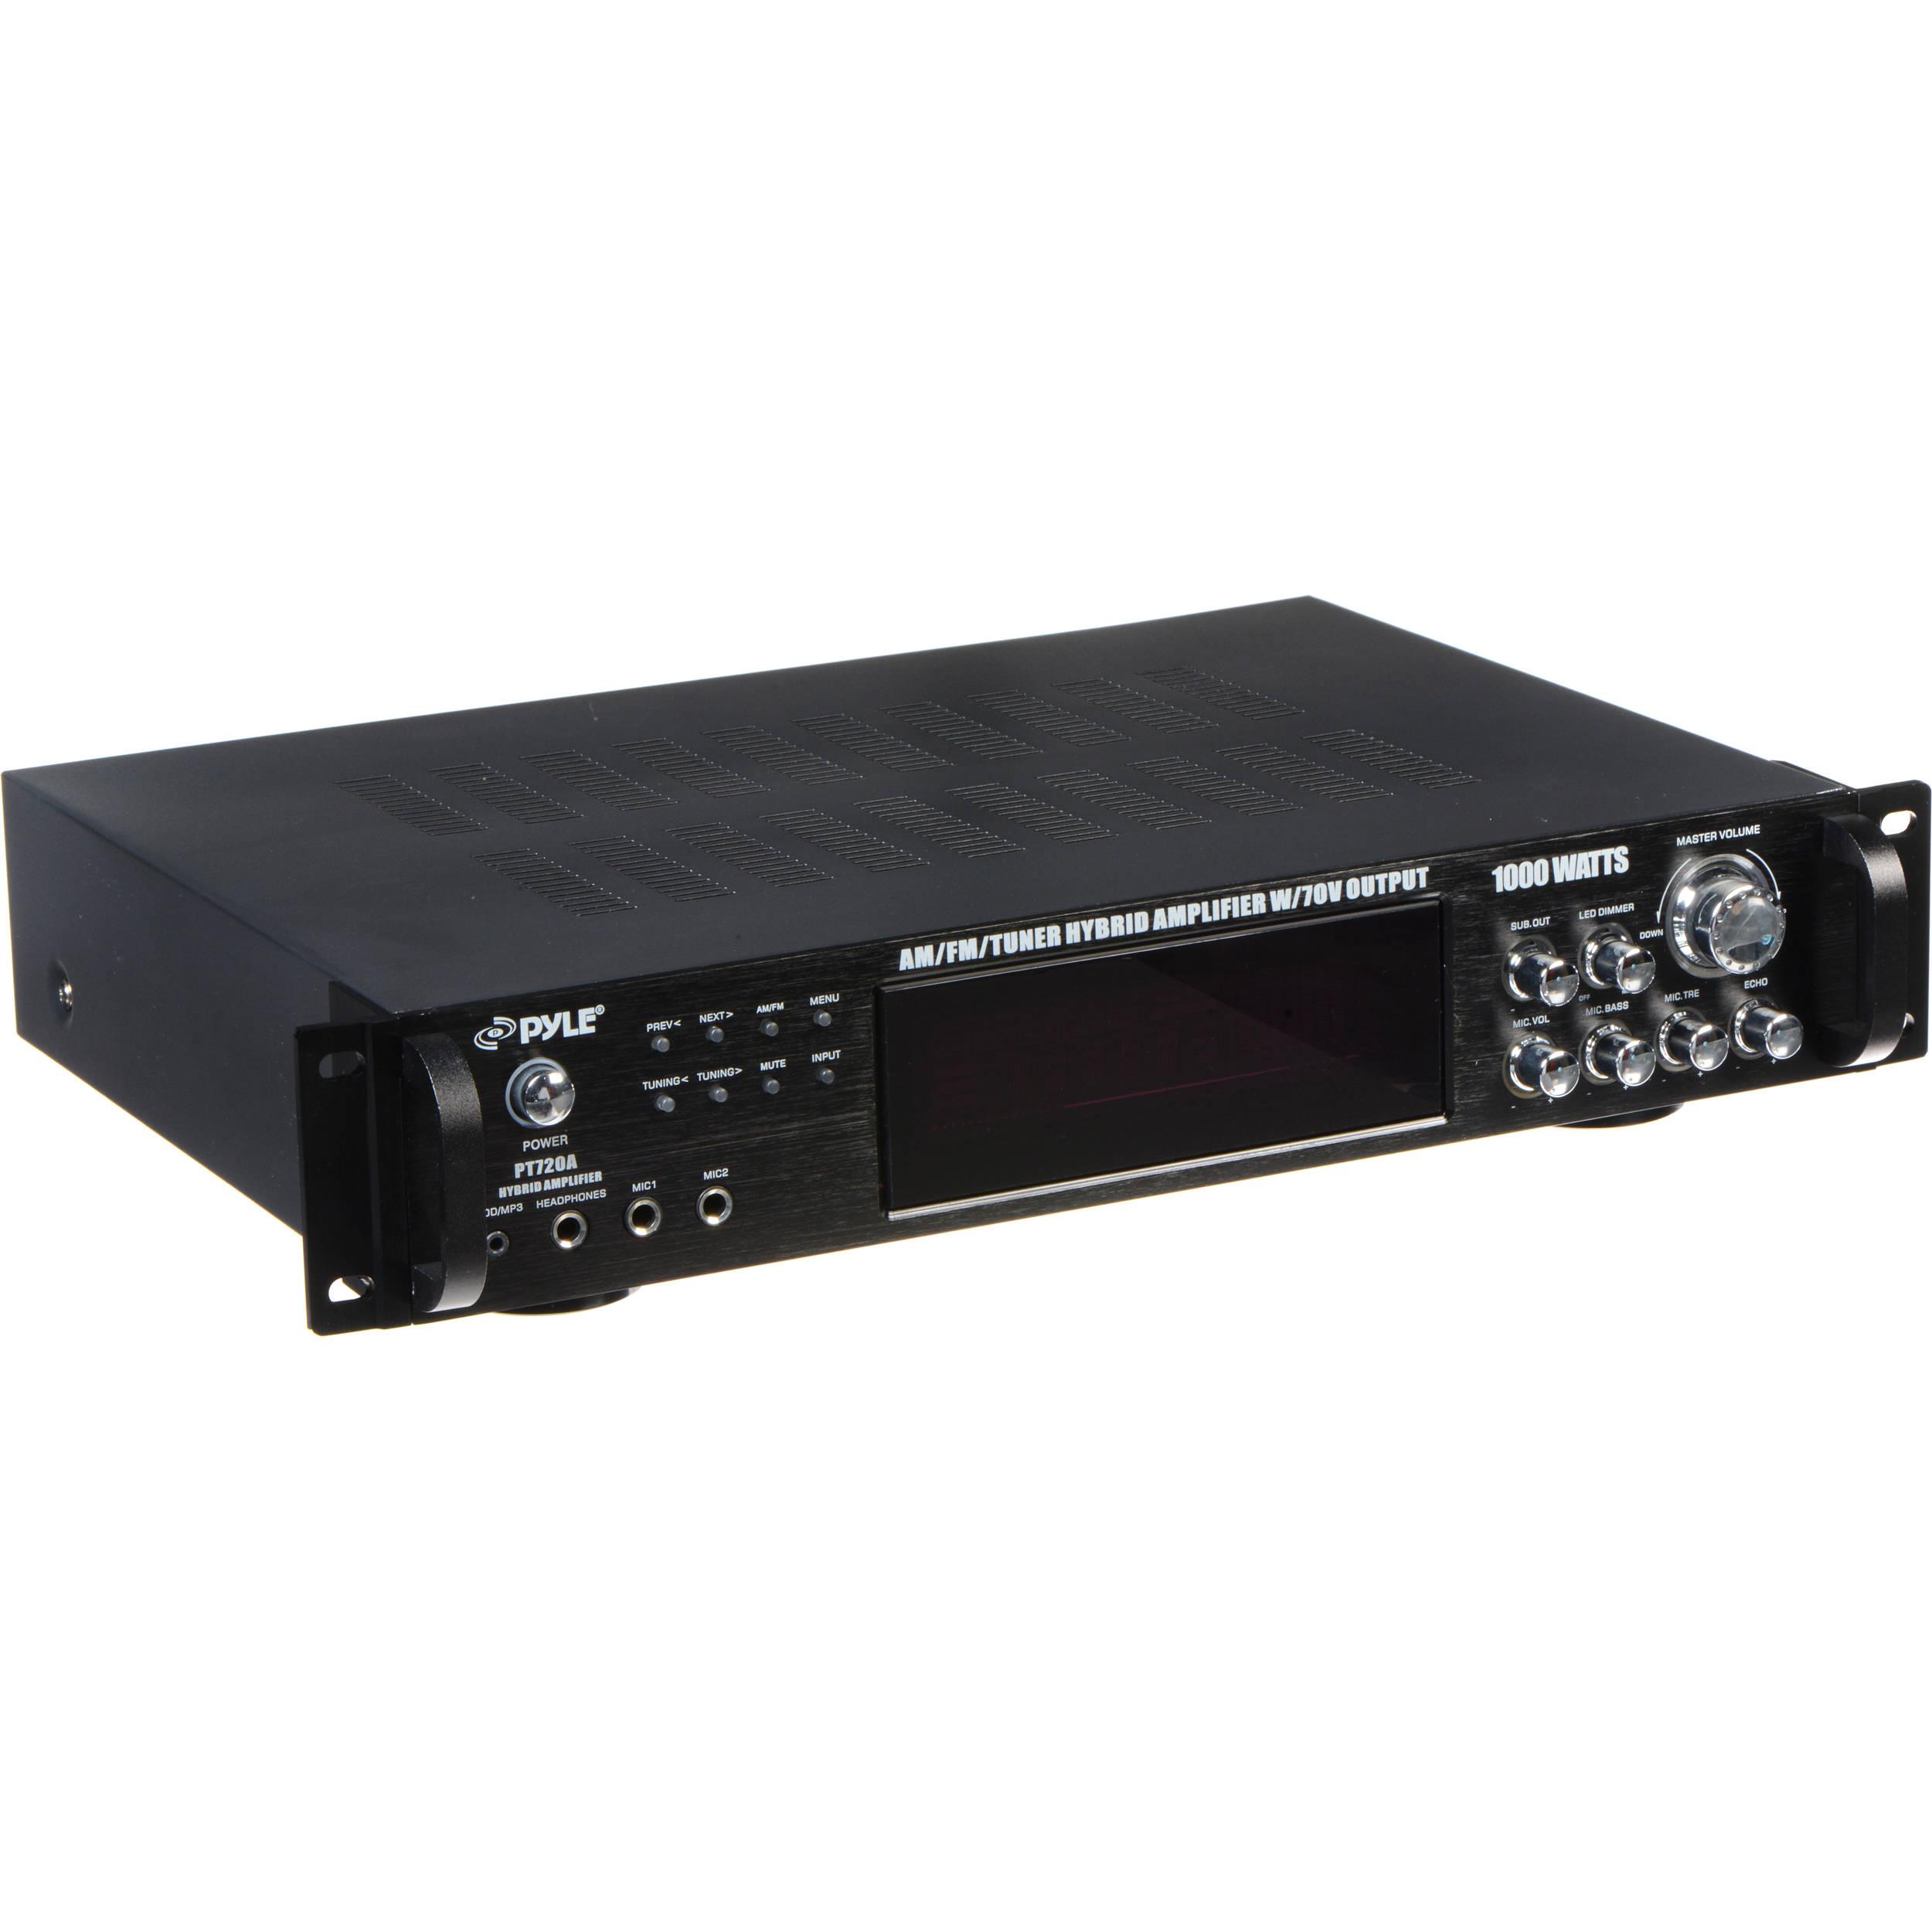 Pyle Pro Pt720a 1000w Peak Hybrid Amplifier With Am Fm Tuner